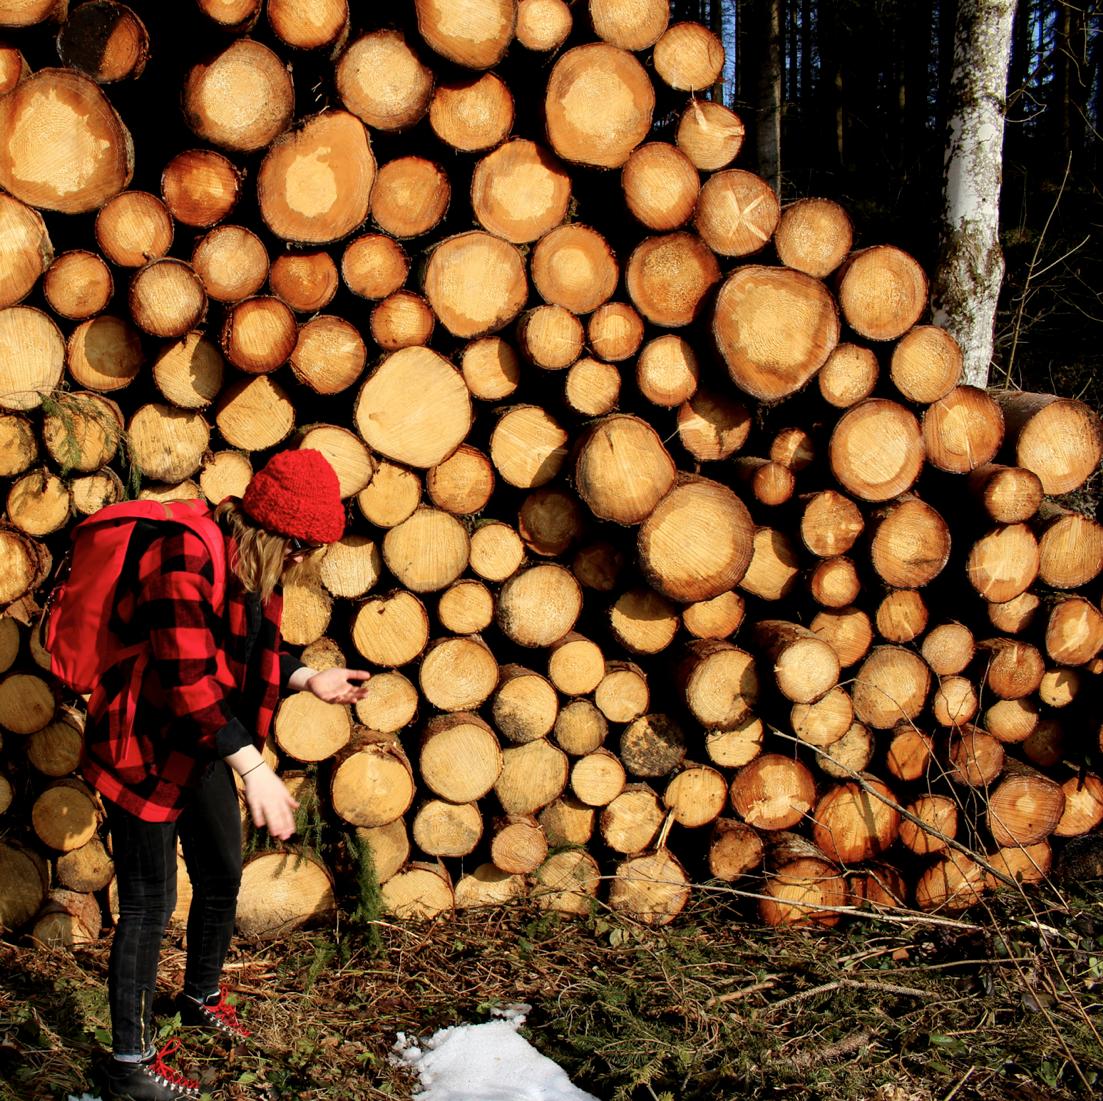 maybeyoulike_lumberjack_woods6